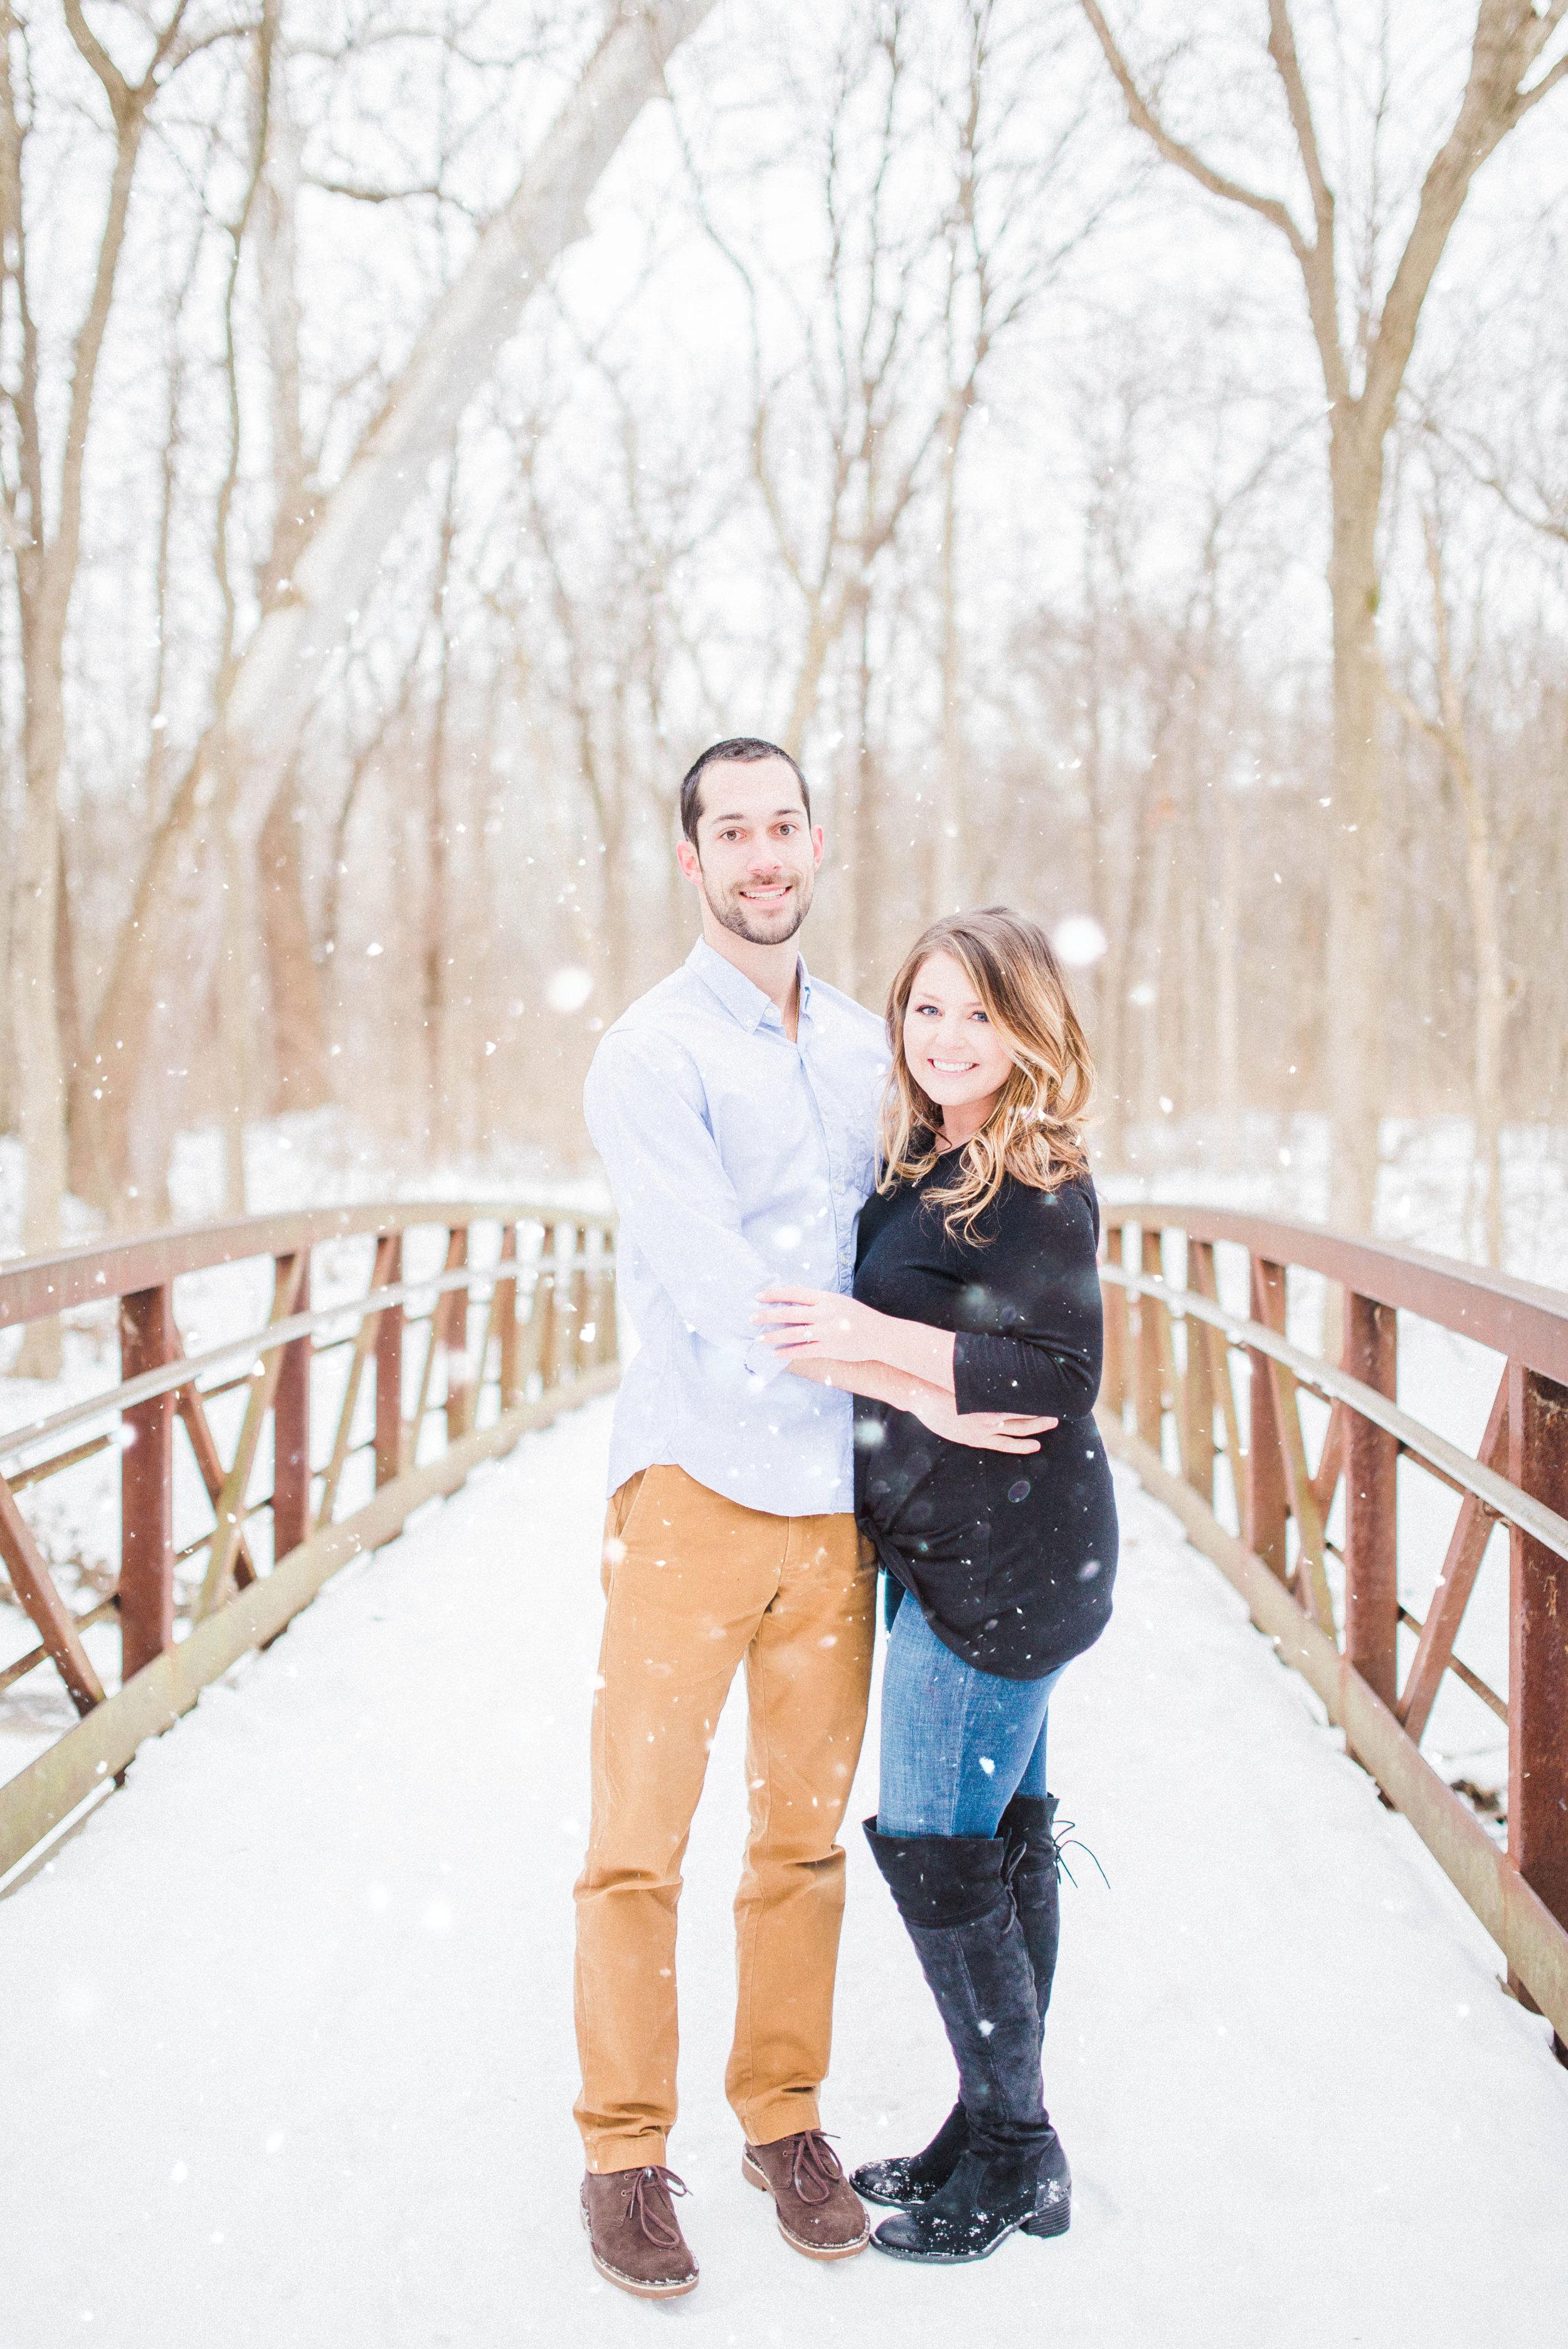 Fine Art Indianapolis Destination Wedding Photographer - Winter Snow Engagement Session